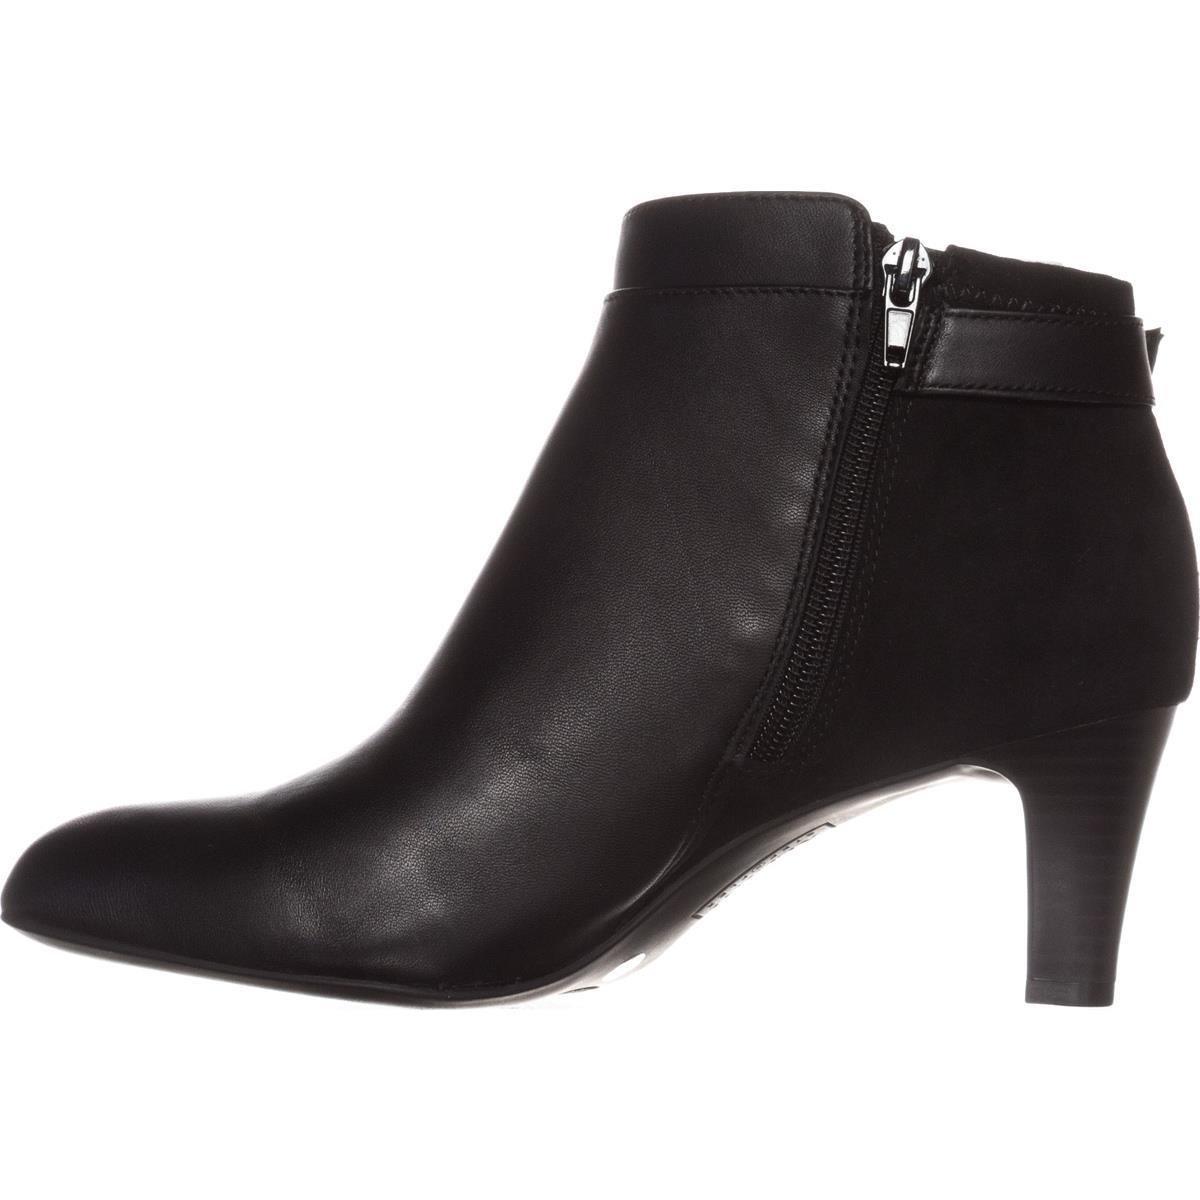 Alfani femmes Valmontt Leather Almond Toe Ankle Fashion bottes